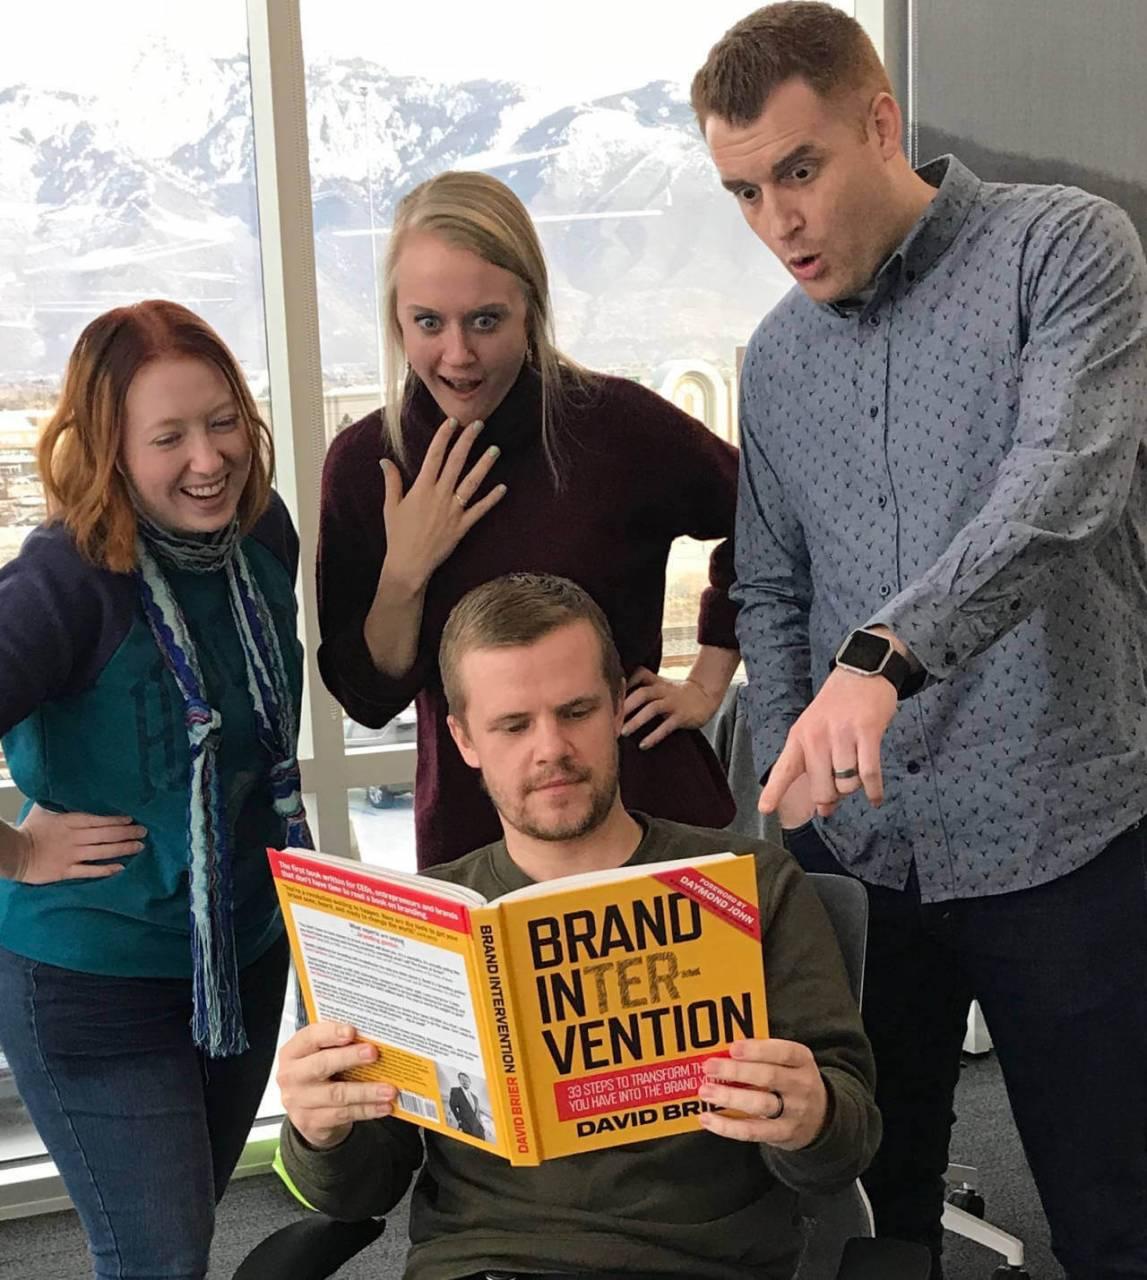 Brand Intervention and Lucidpress